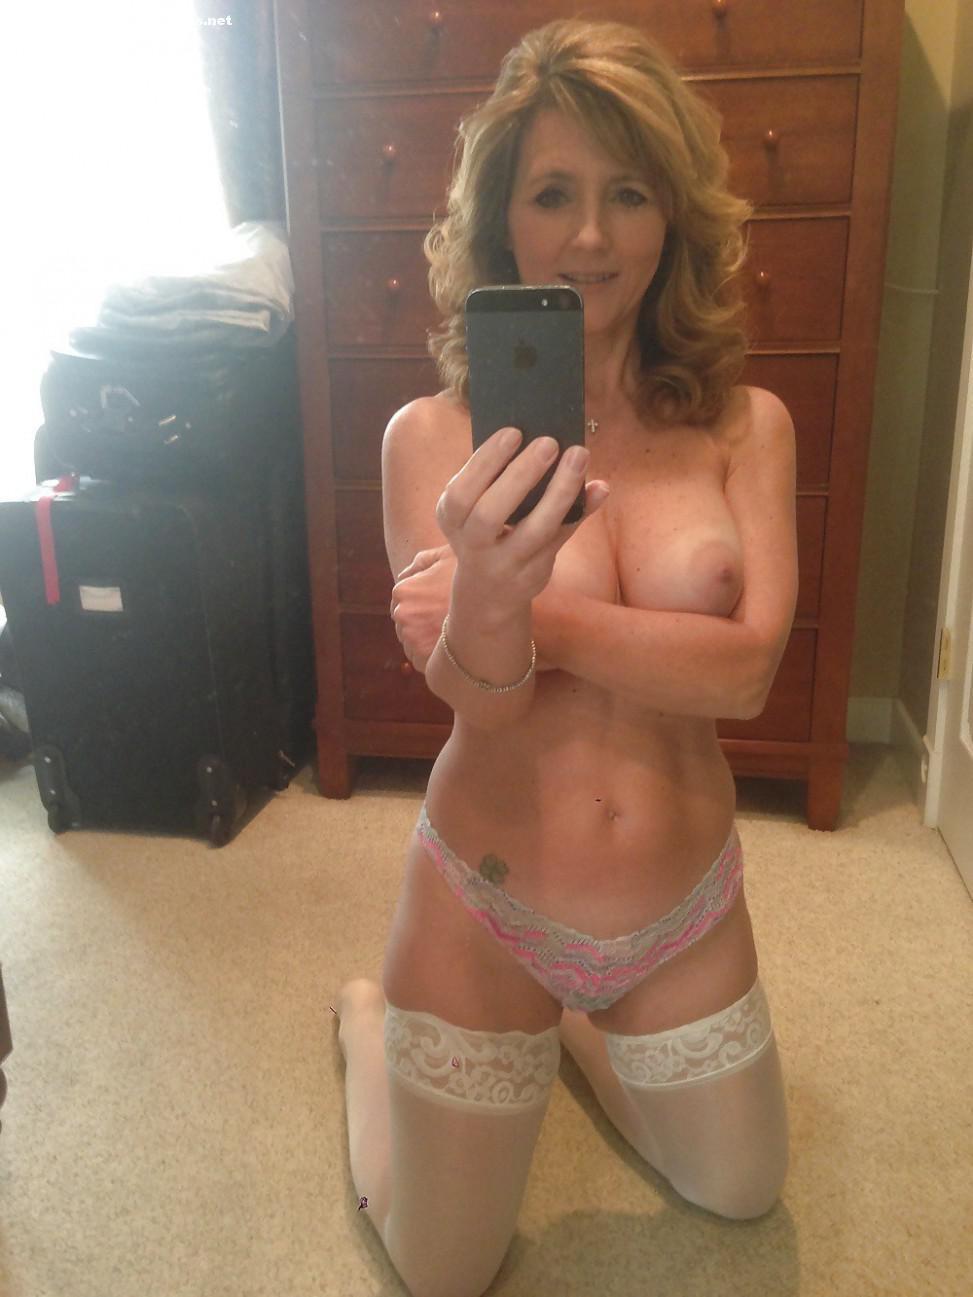 girl virgin hot sex big dick picture